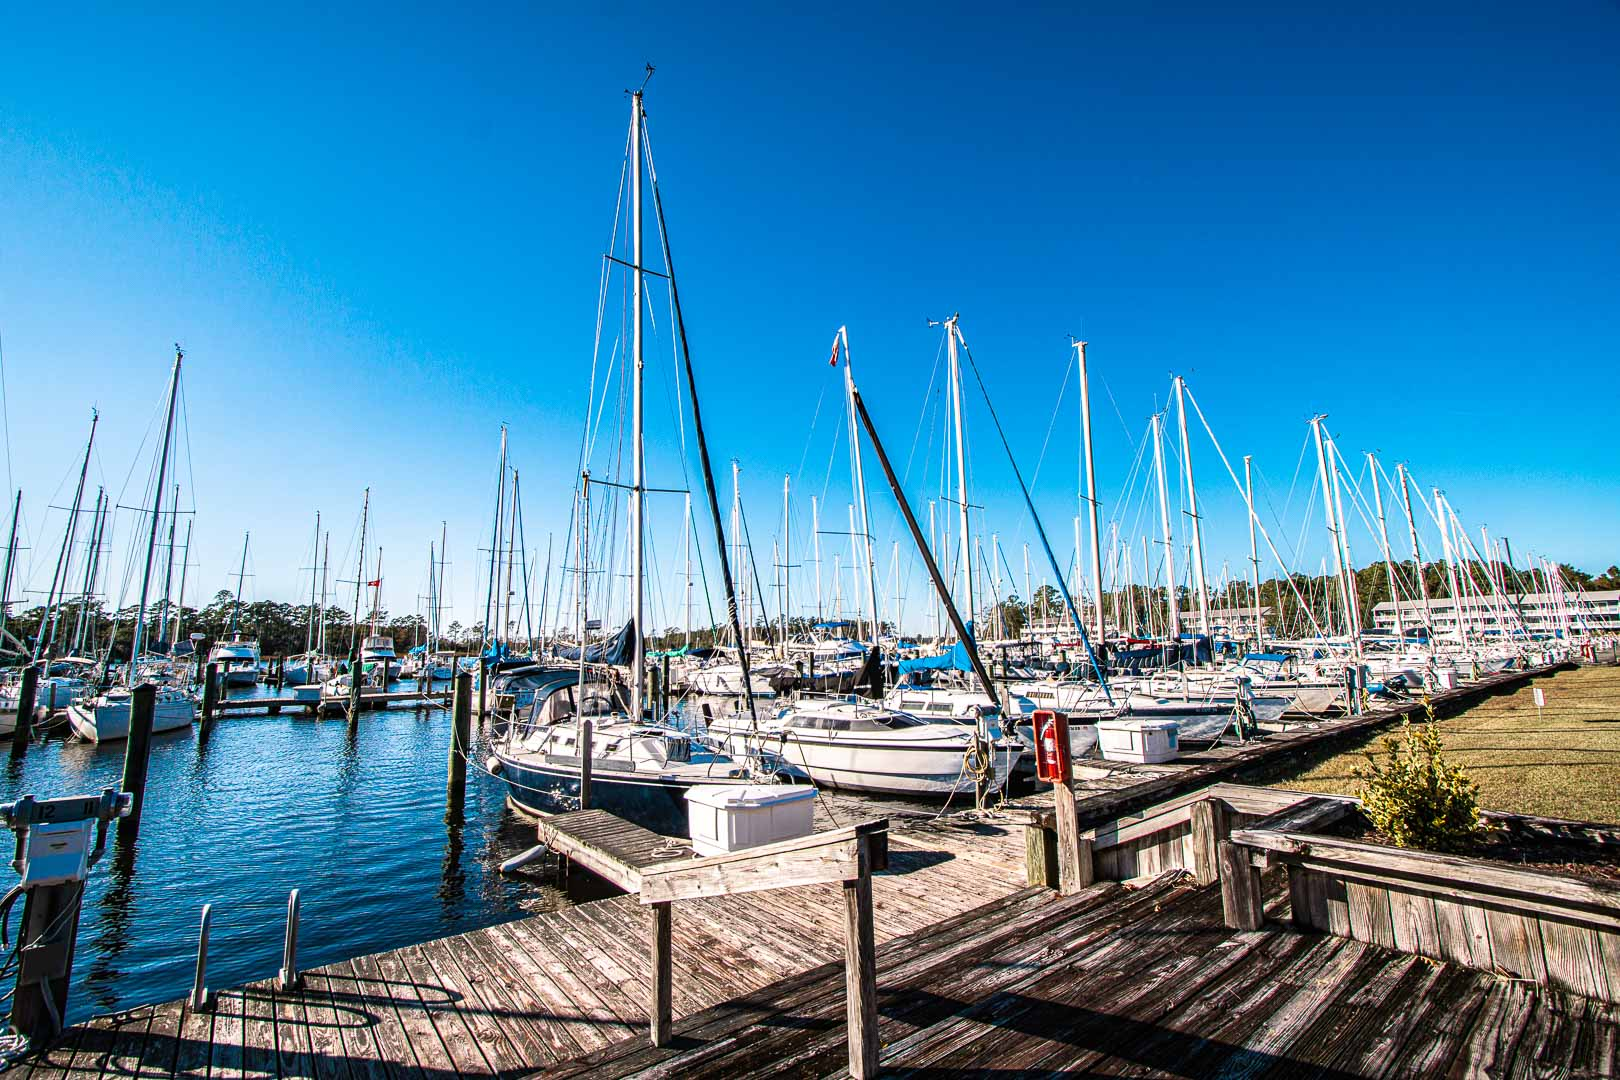 A scenic view of the boat dock at VRI's Harbourside II in New Bern, North Carolina.